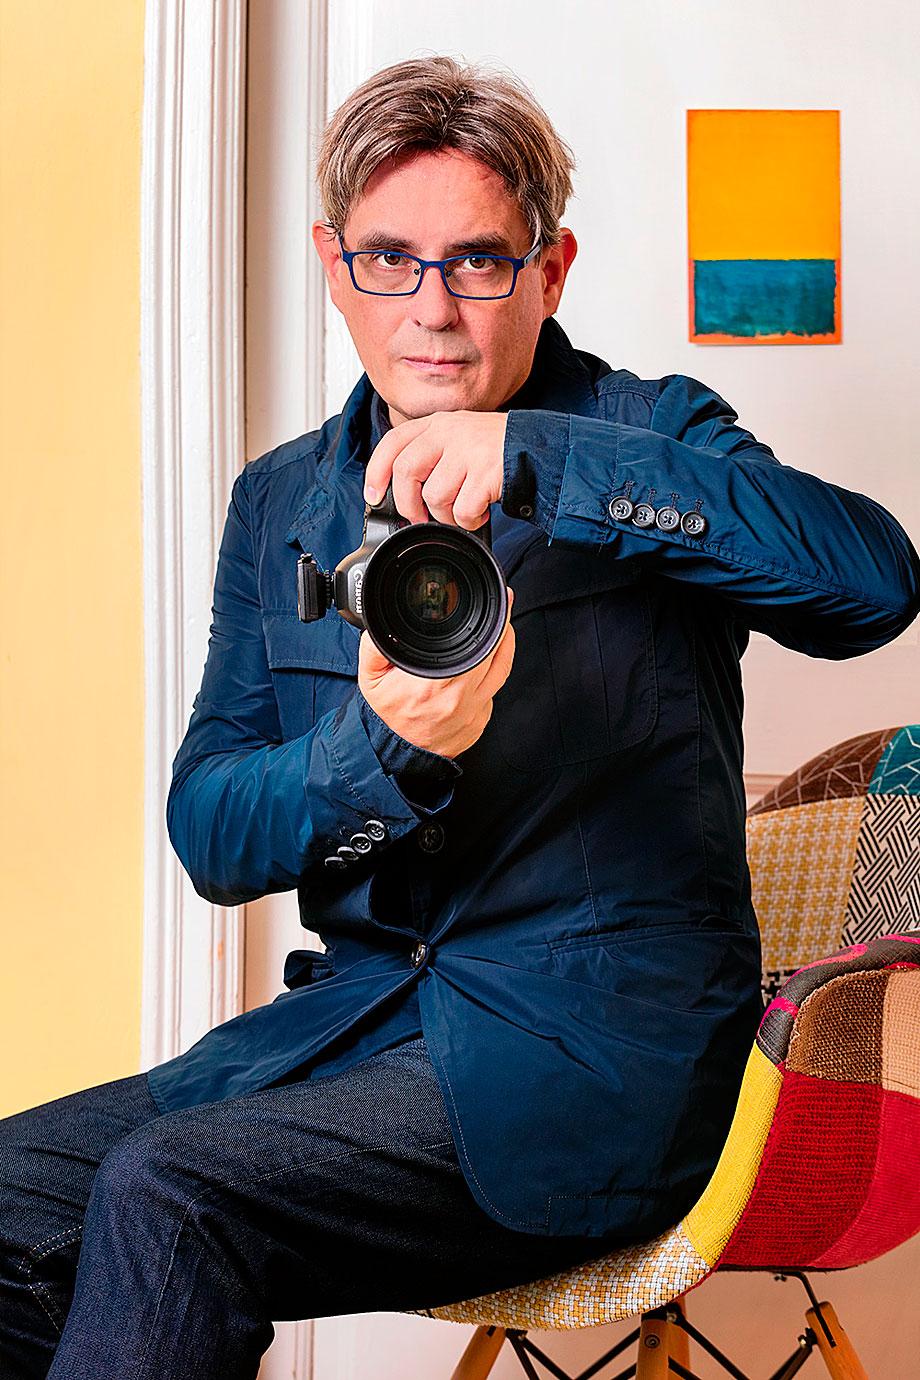 entrevista-fotografo-david-cardelus-1